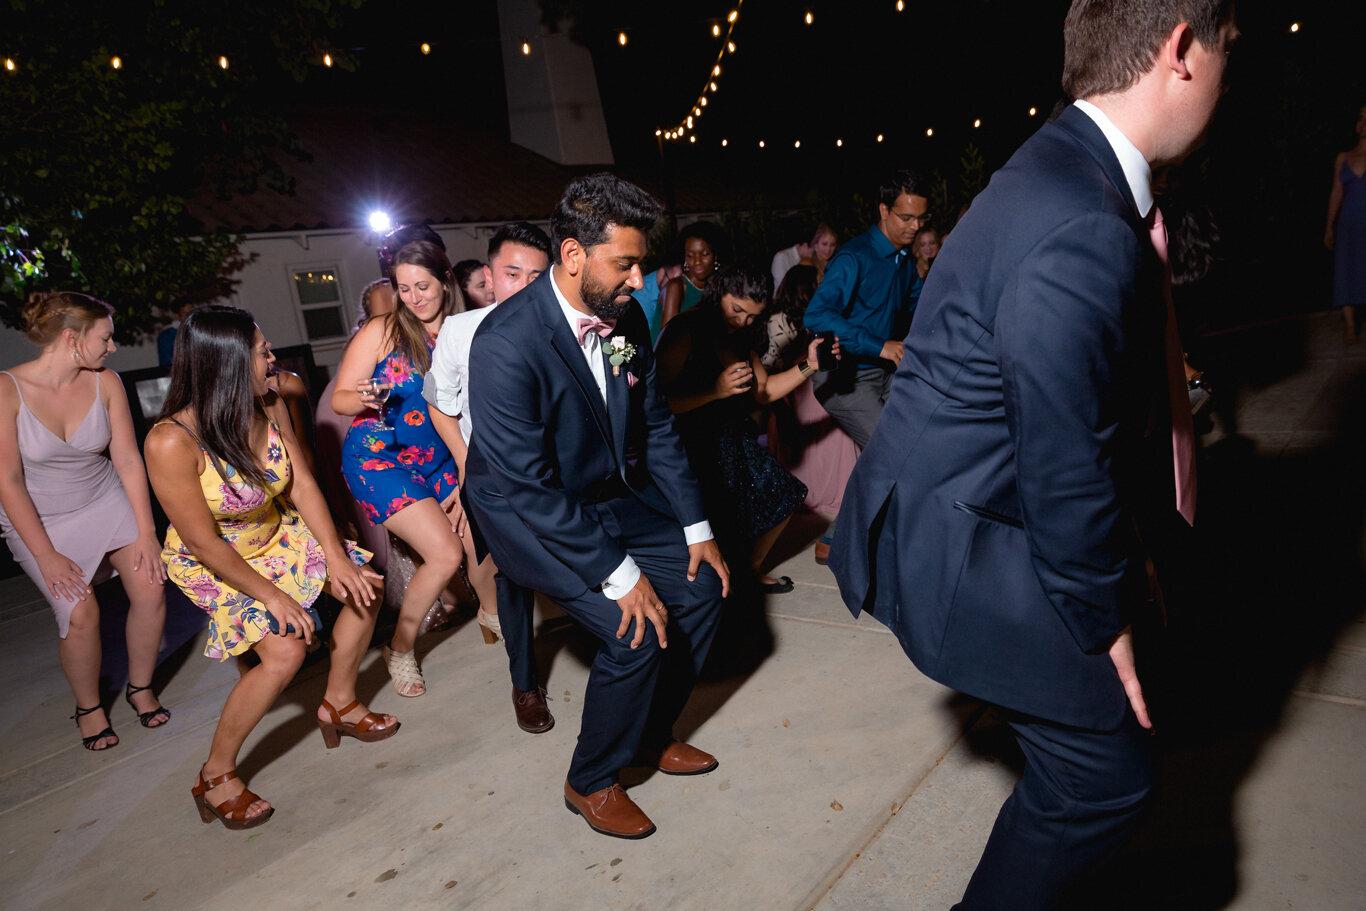 2019.08.24_Emily-Ashir-Wedding-at-the-Maples-6542.jpg